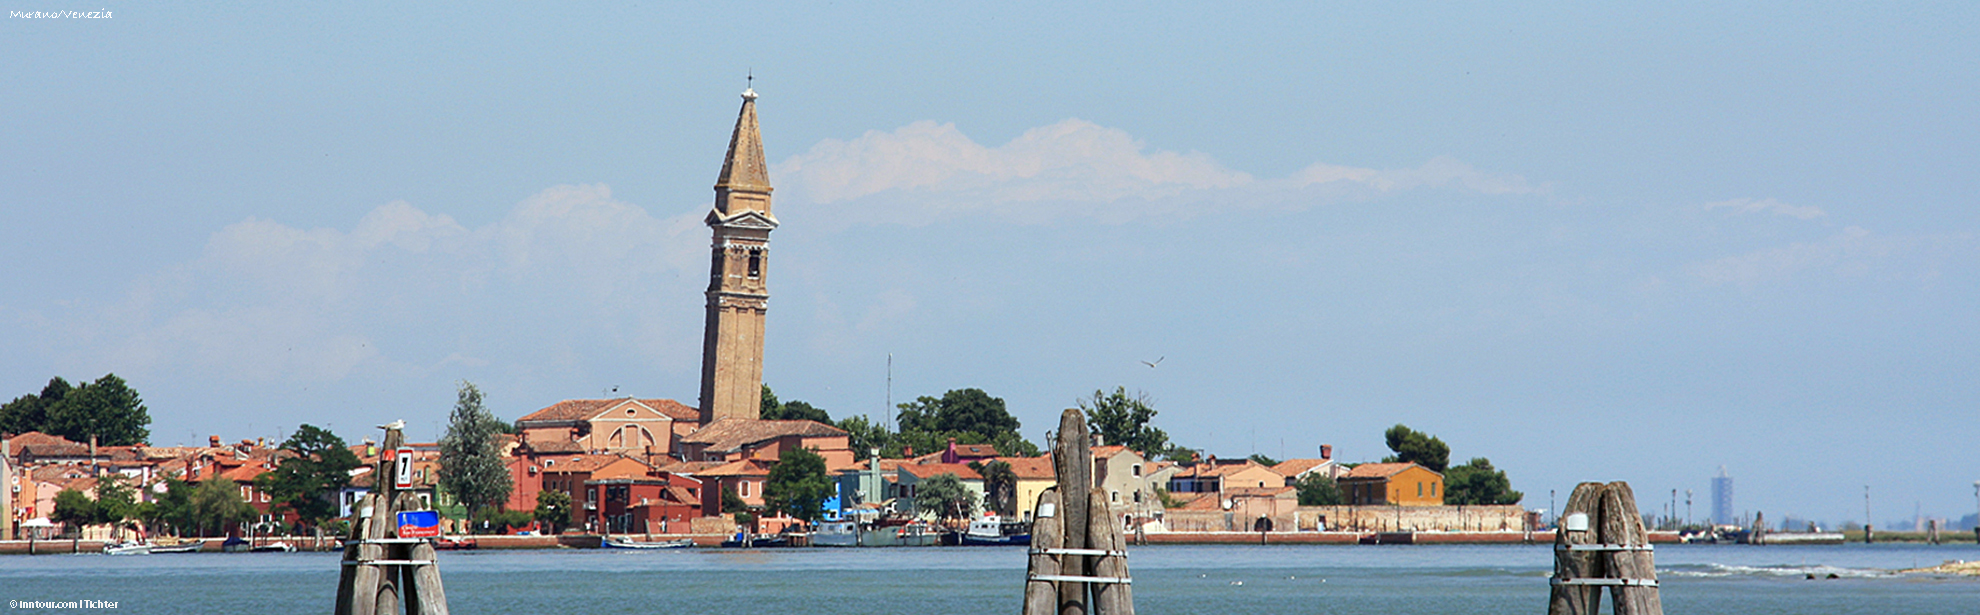 Oklassinntour_Tichter_Murano-Venezia_IMG_3543